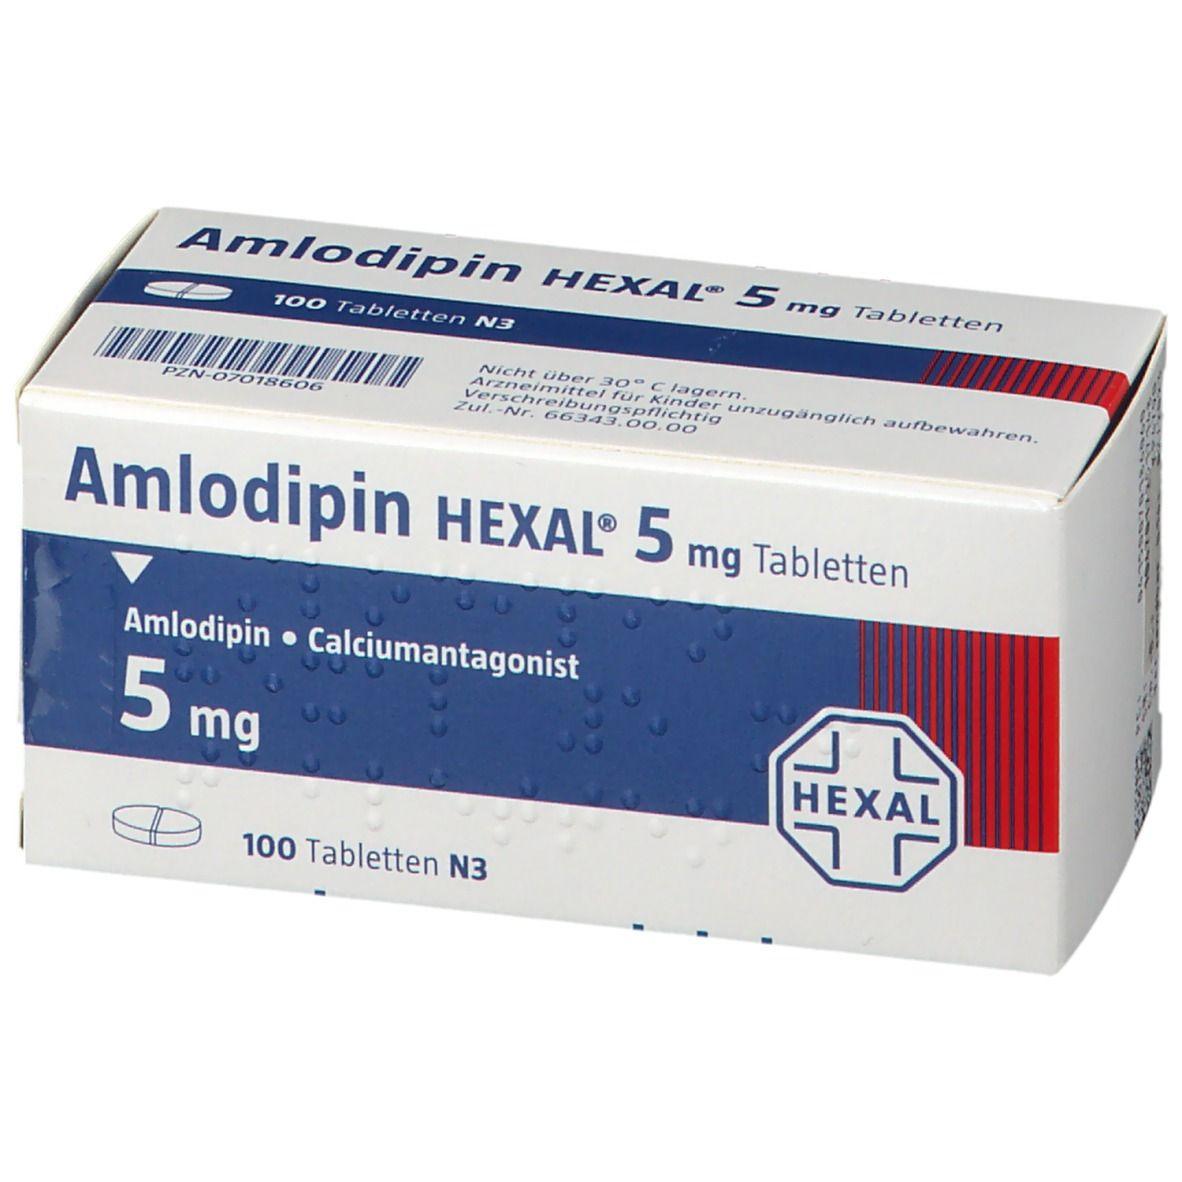 Amlodipin Orion 5 Mg